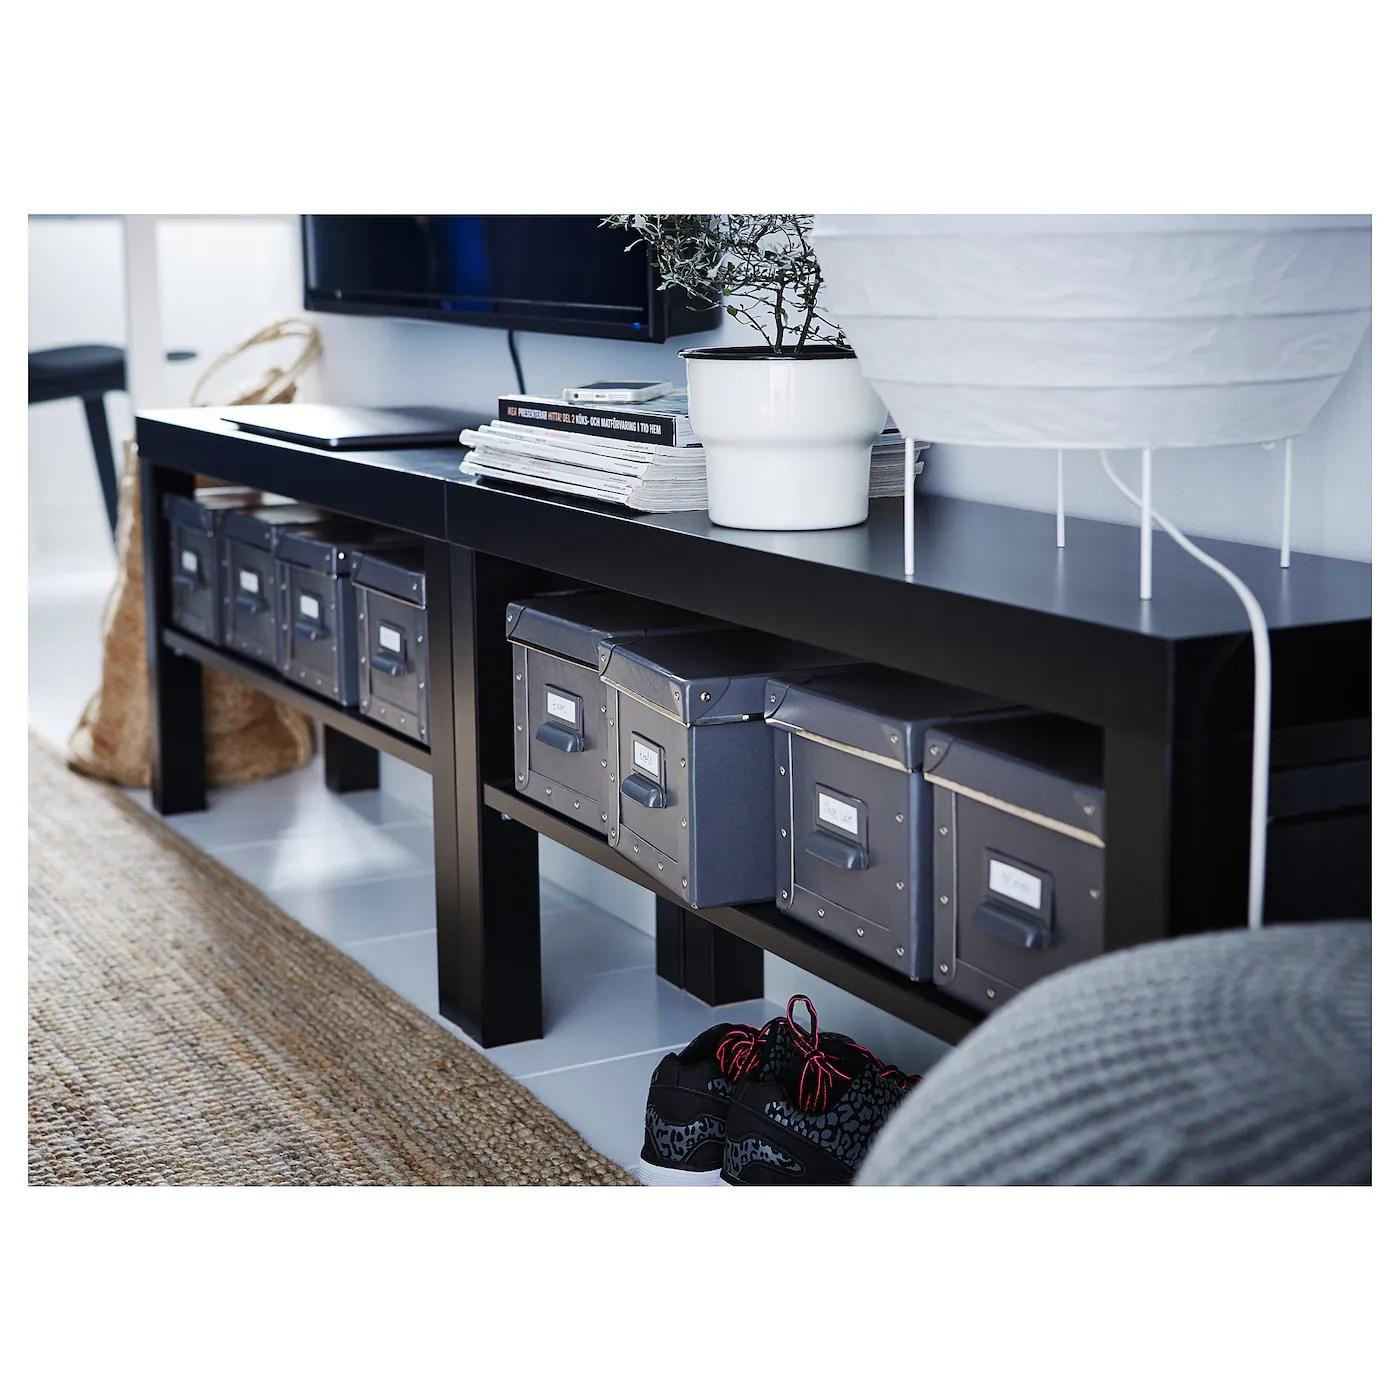 lack tv bench black 35 3 8x10 1 4x17 3 4 90x26x45 cm